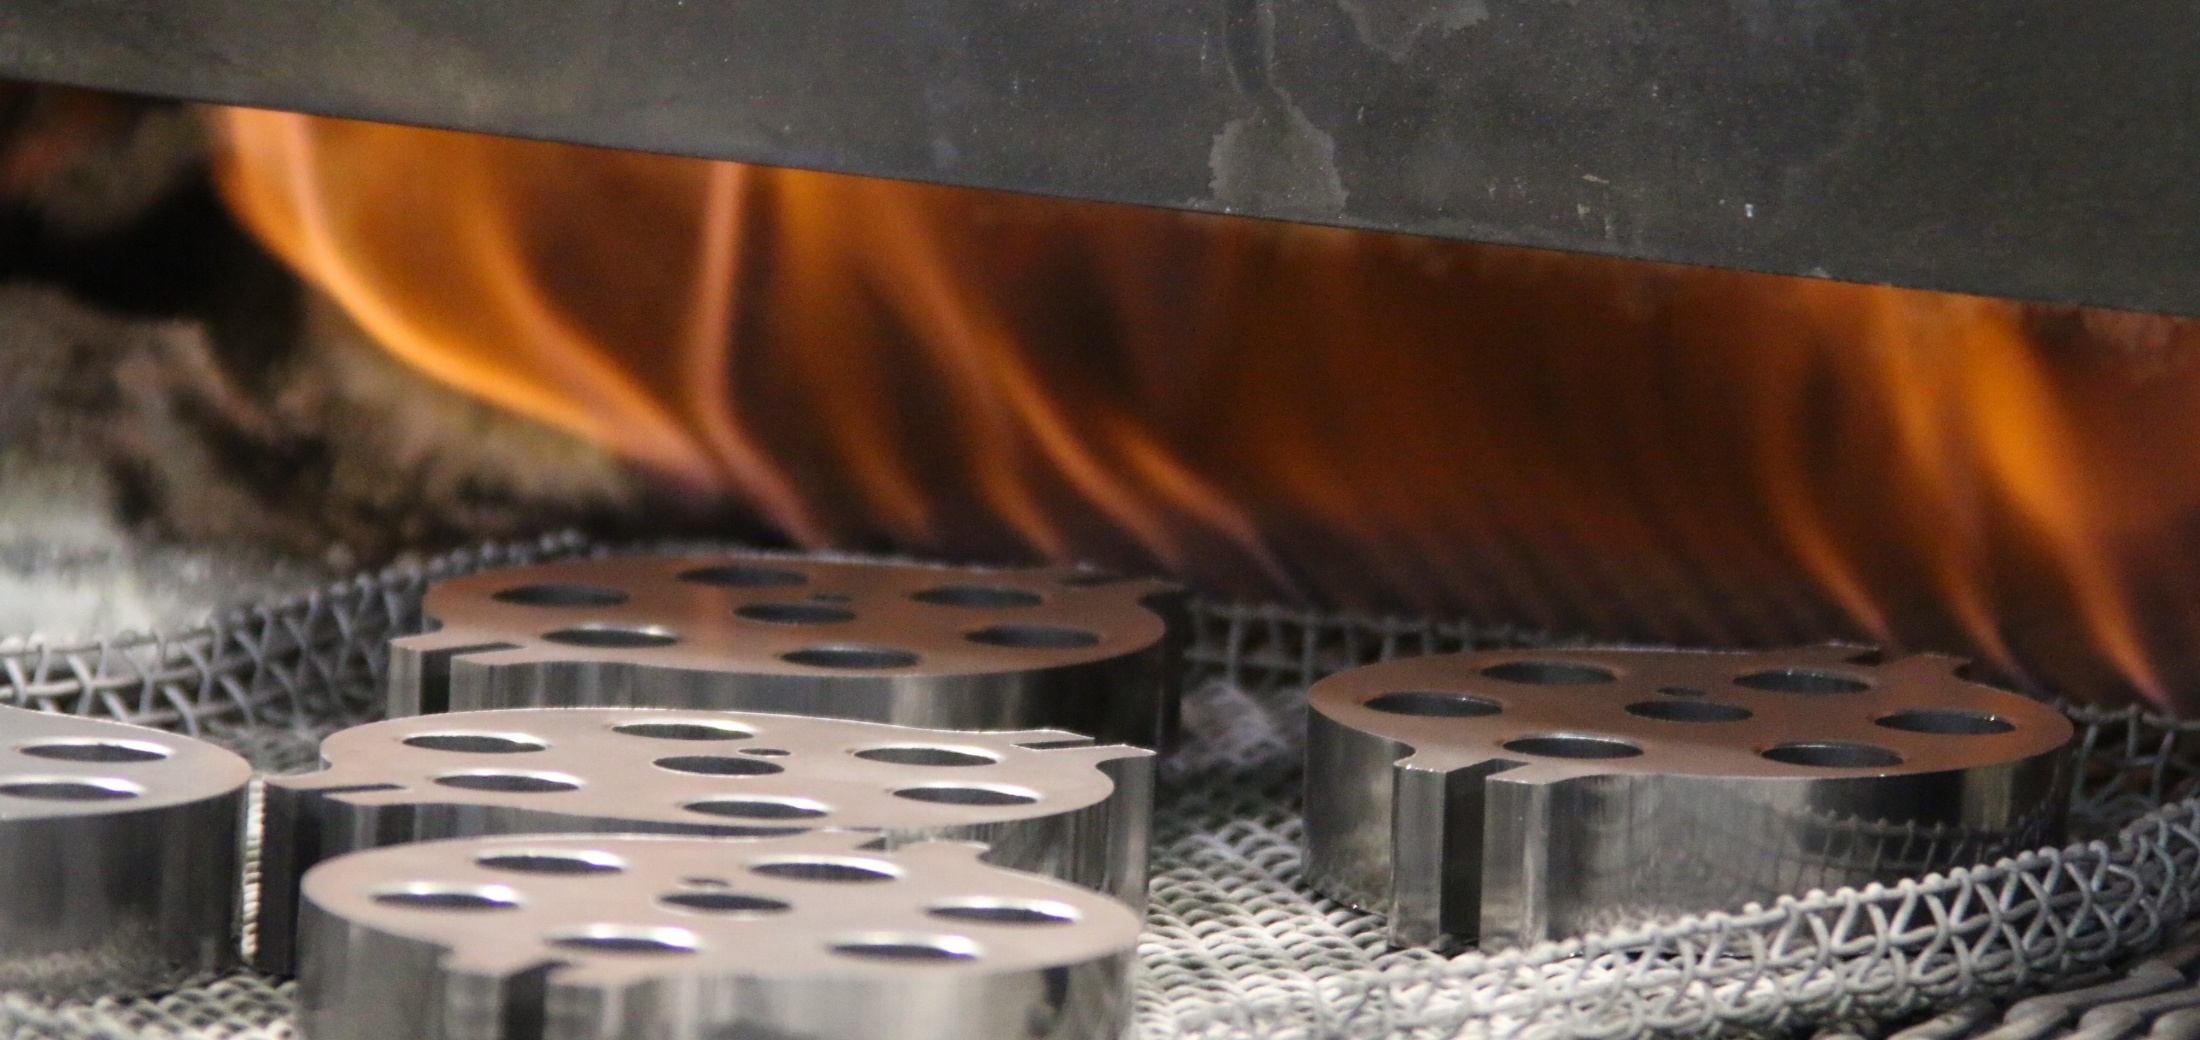 powder-metal-processes.jpg